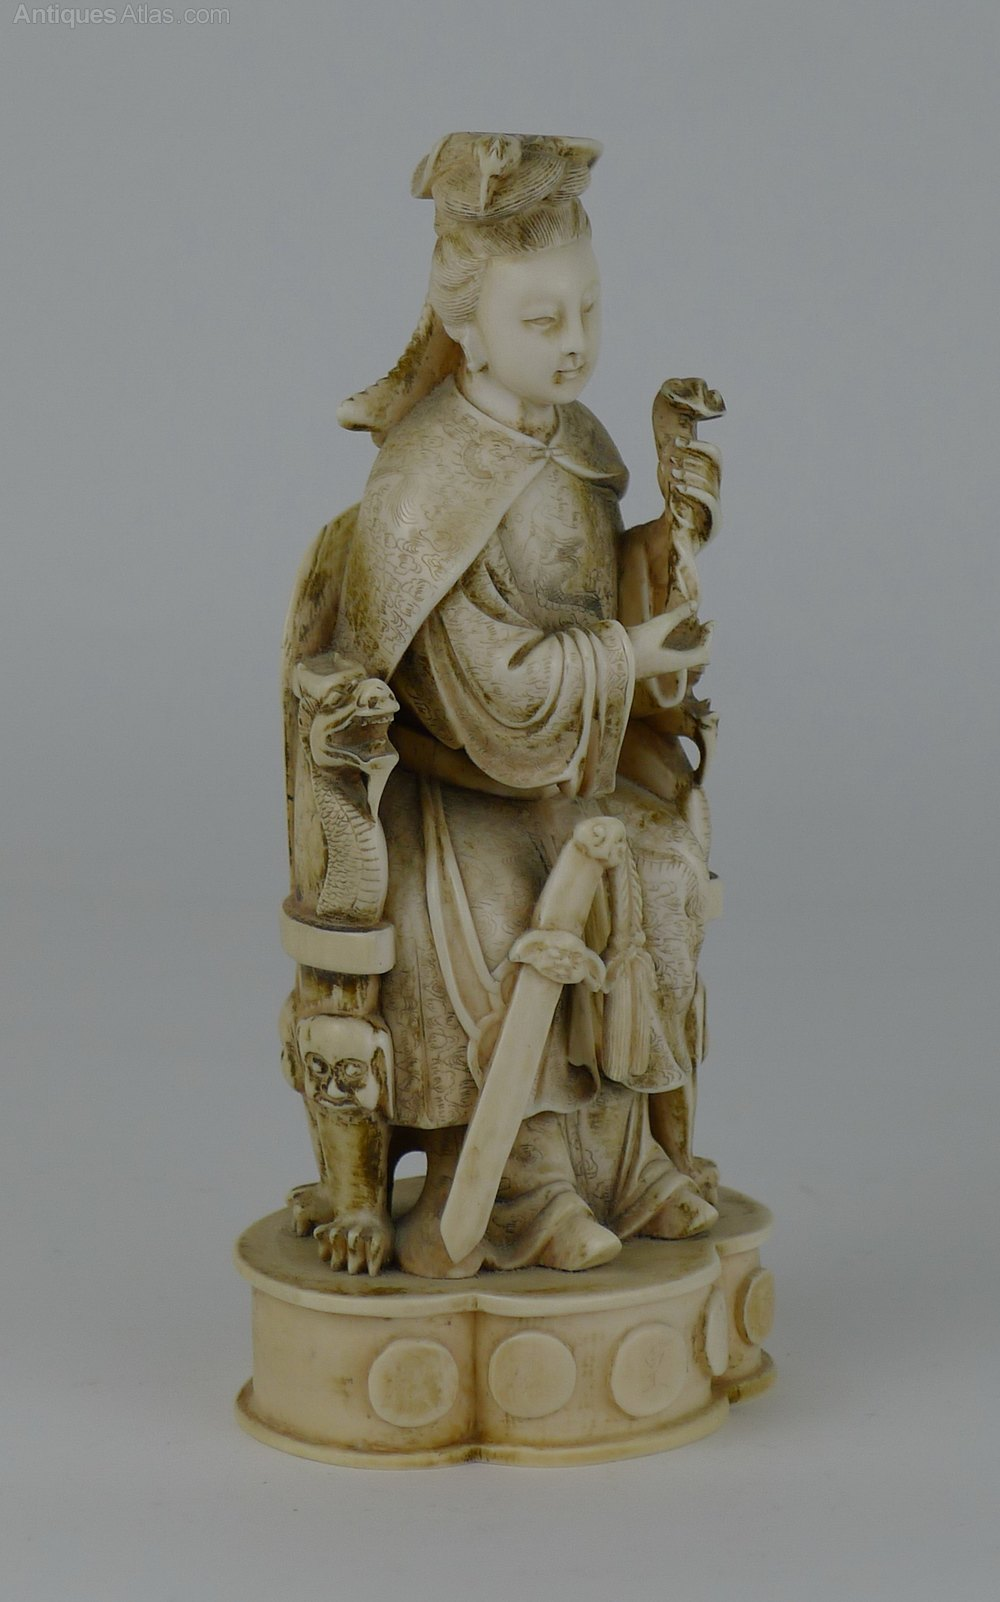 Dealer Com Login >> Antiques Atlas - Quality 19th C Chinese Ivory Goddess